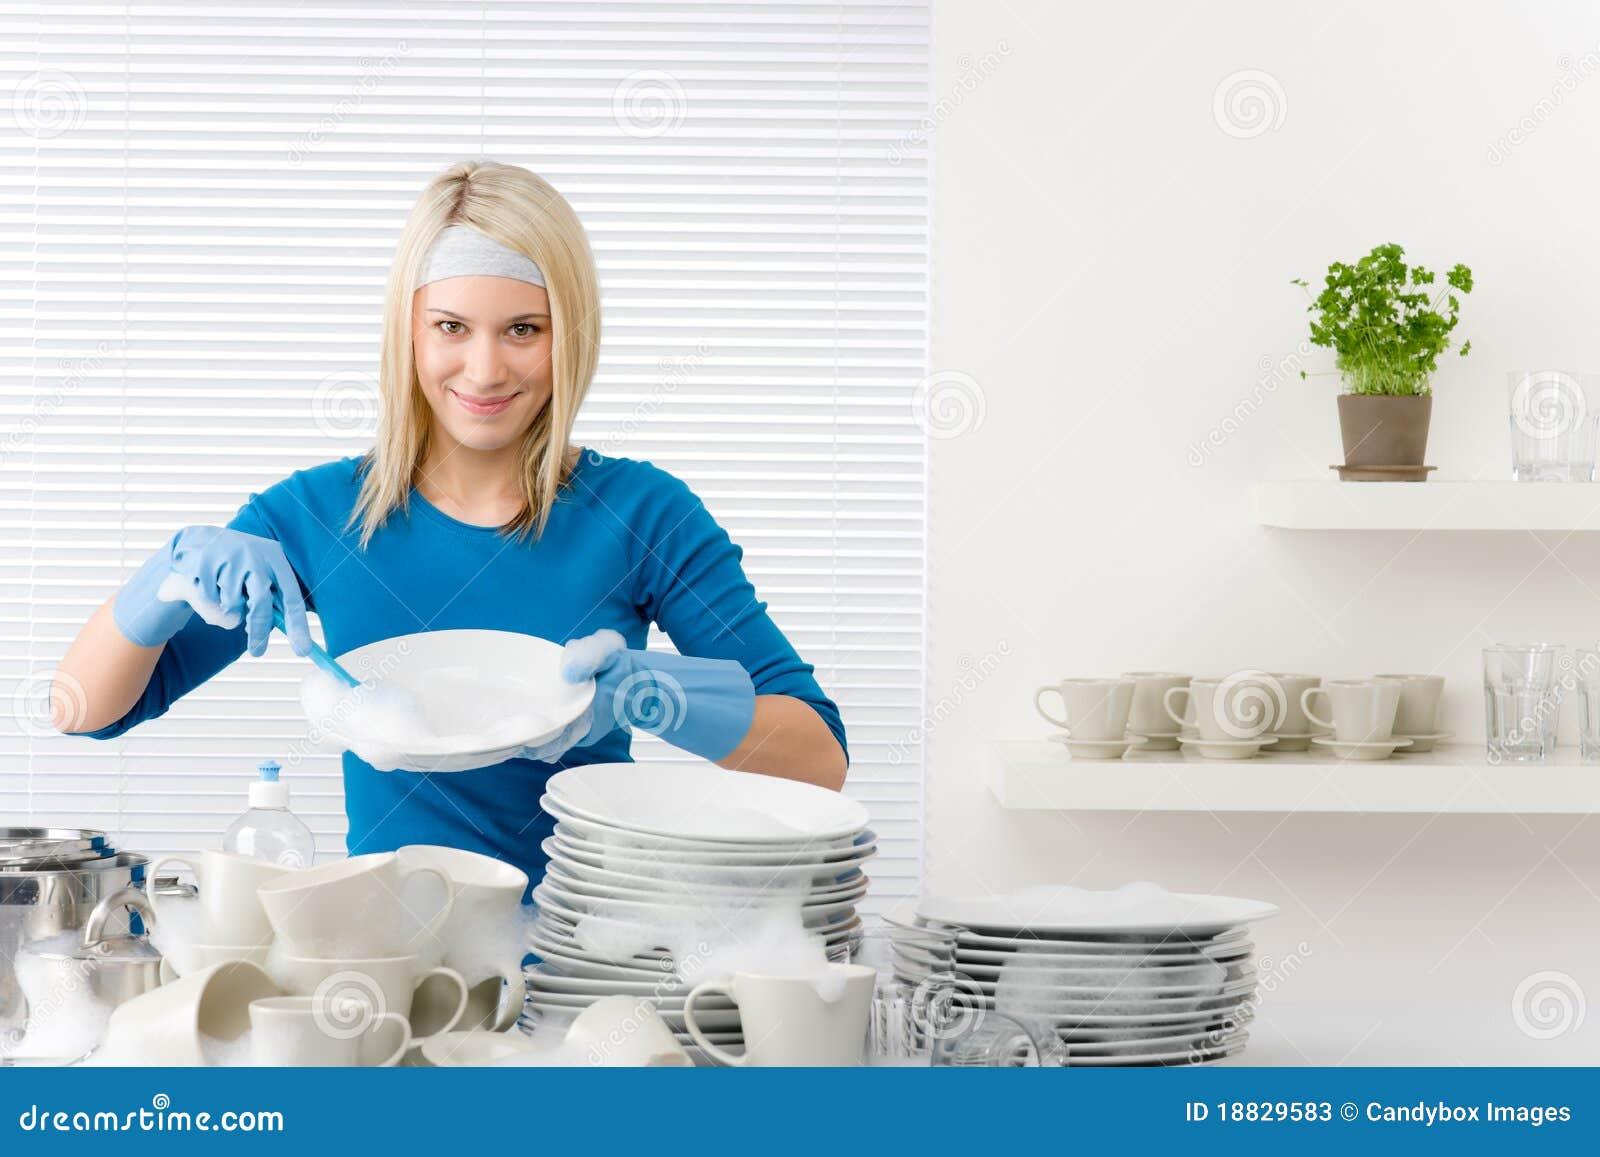 modern kitchen - happy woman washing dishes stock photos - image